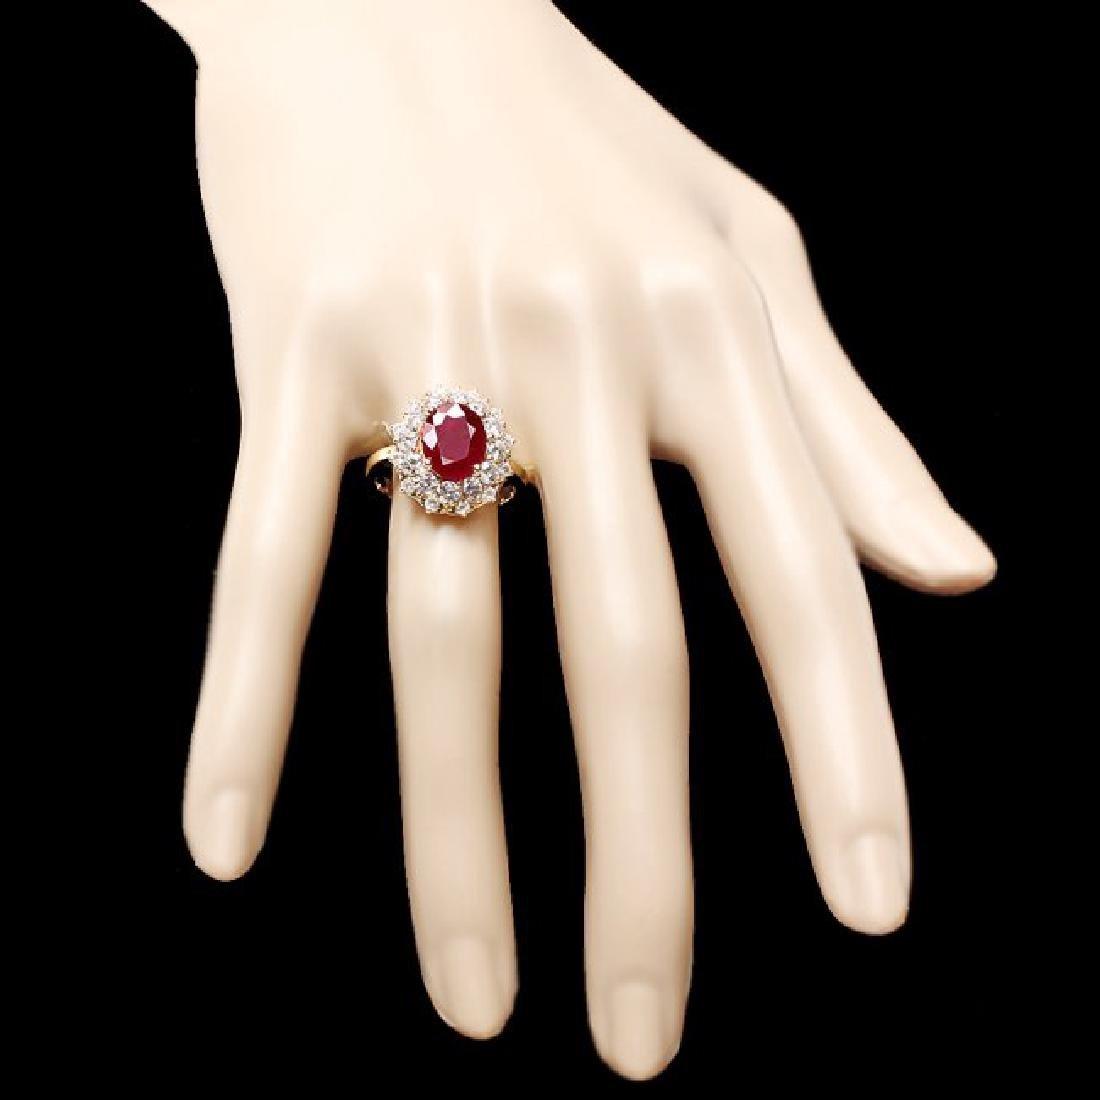 14k Yellow Gold 1.50ct Ruby 1.50ct Diamond Ring - 4